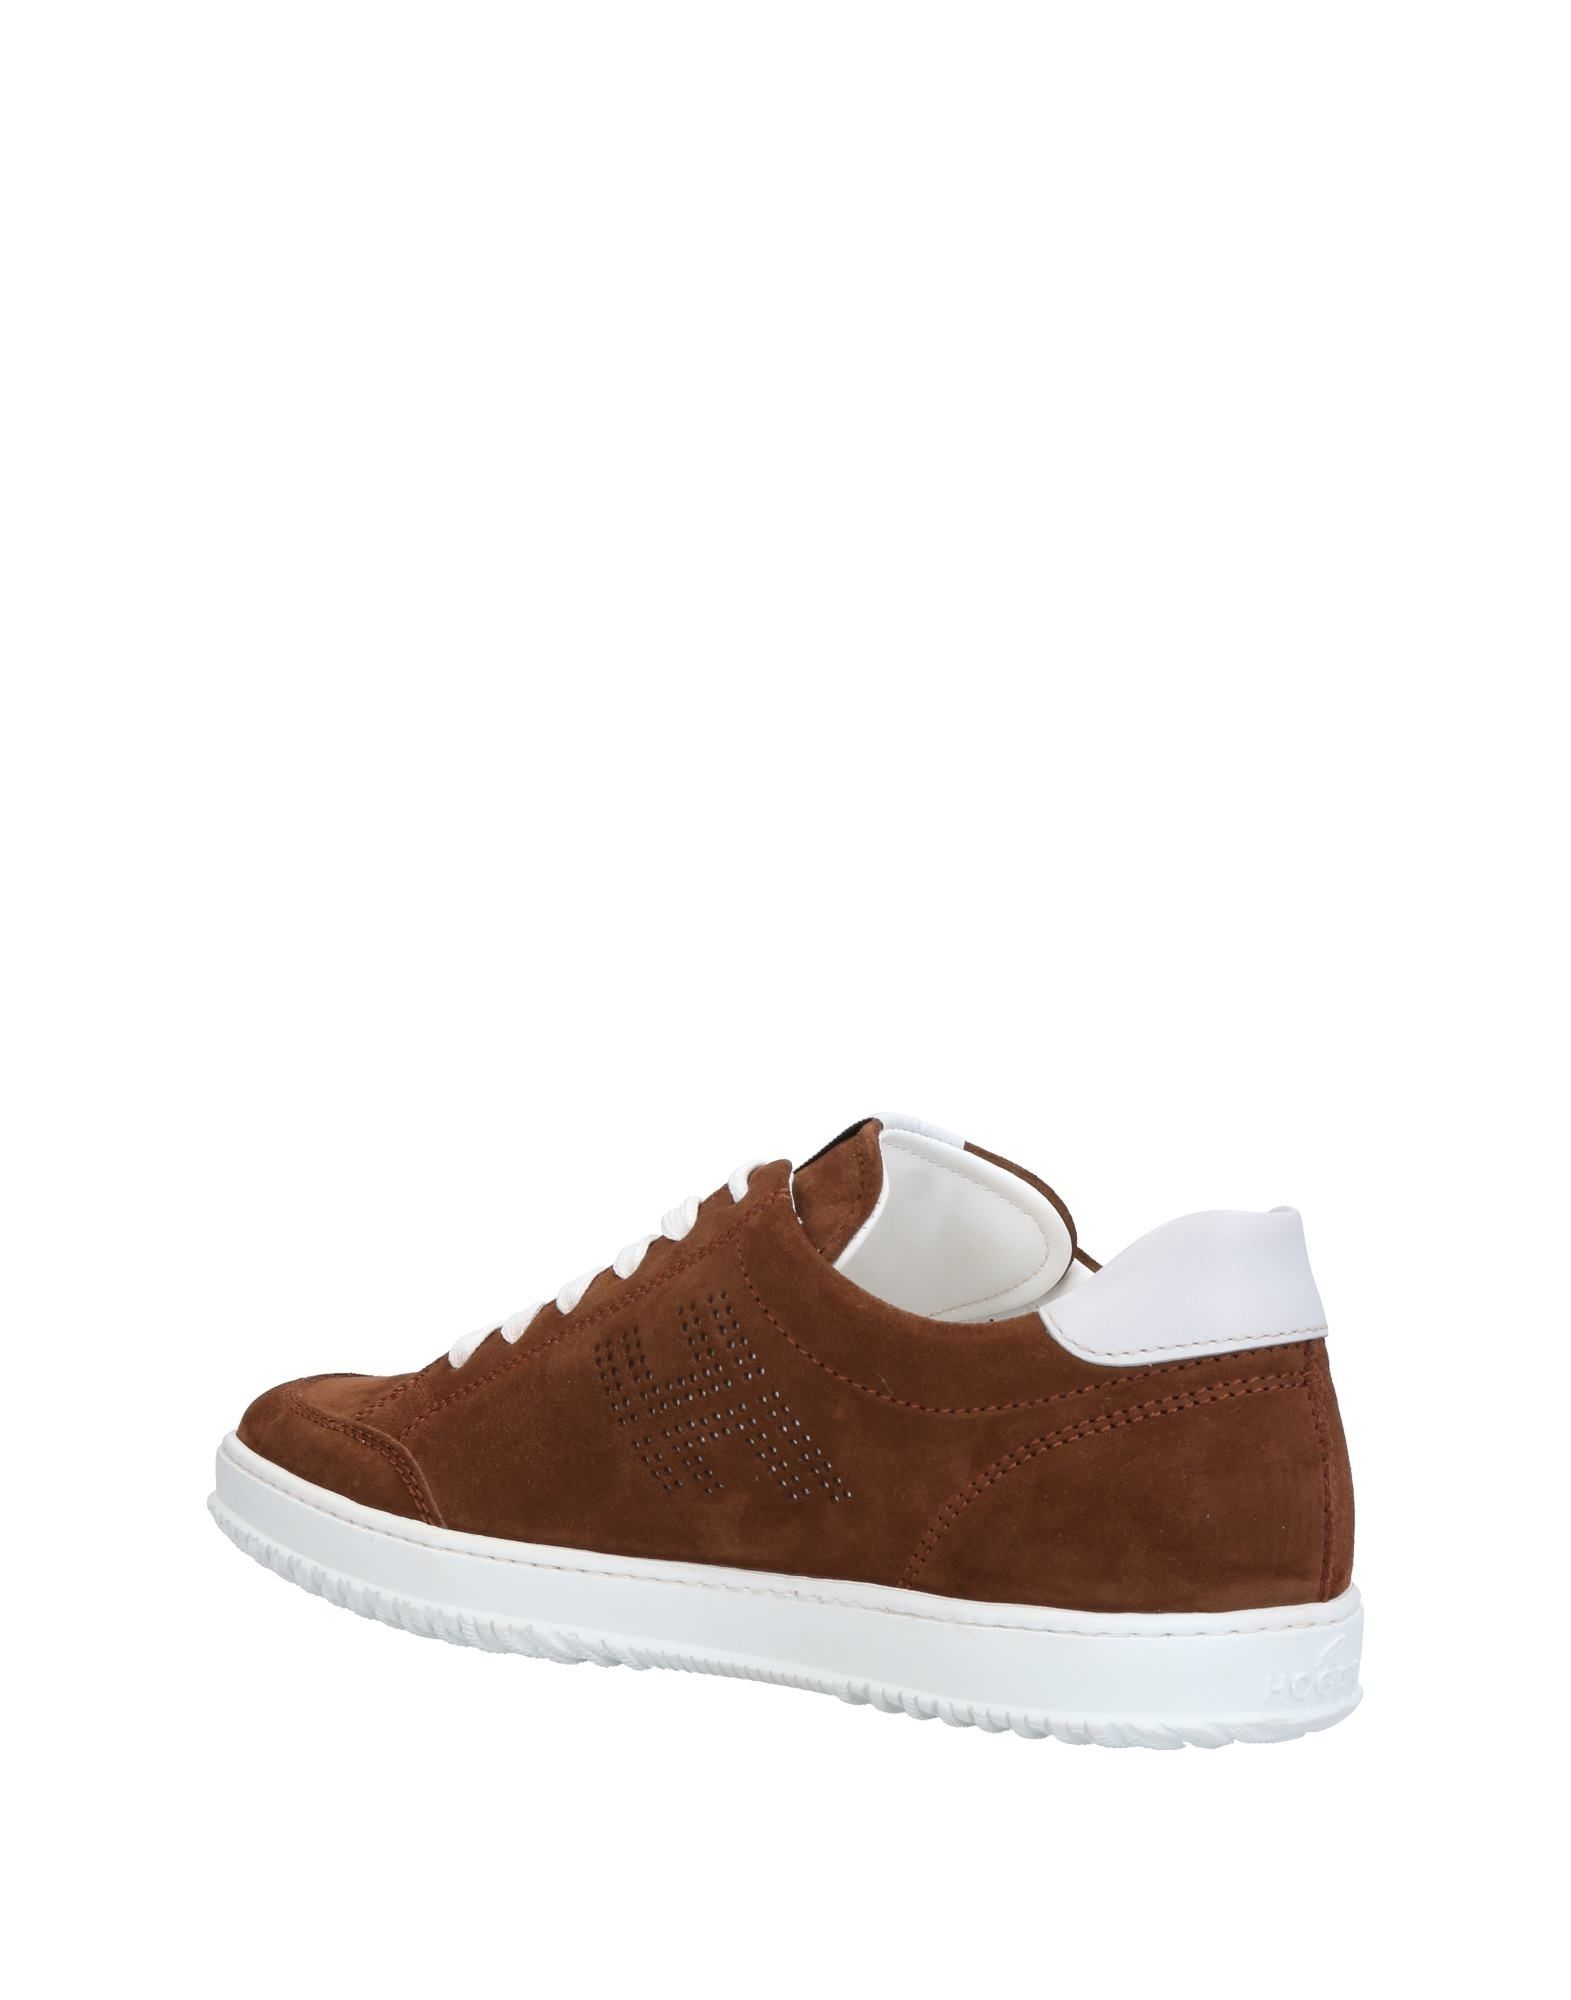 Hogan Sneakers Herren    11435521IT Heiße Schuhe 914a81